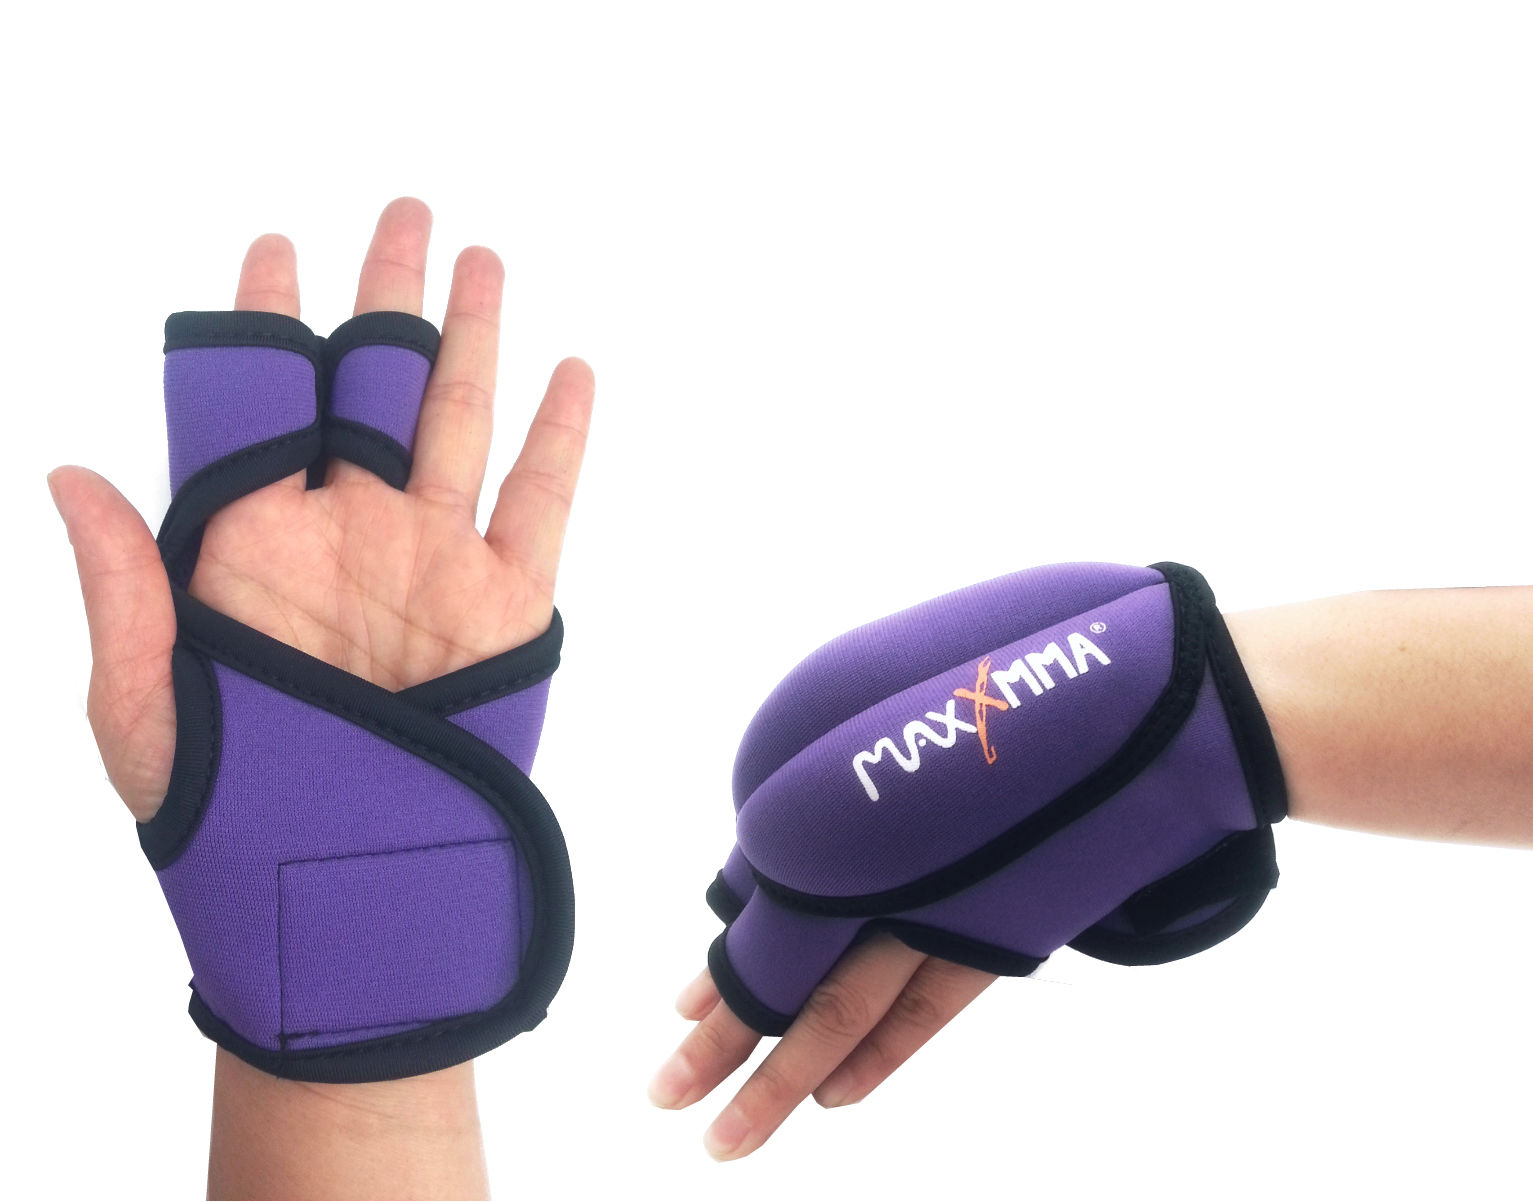 Maxxmma Weighted Gloves 0 75 Lb Ea 1 5 Lb Set Puple Ebay